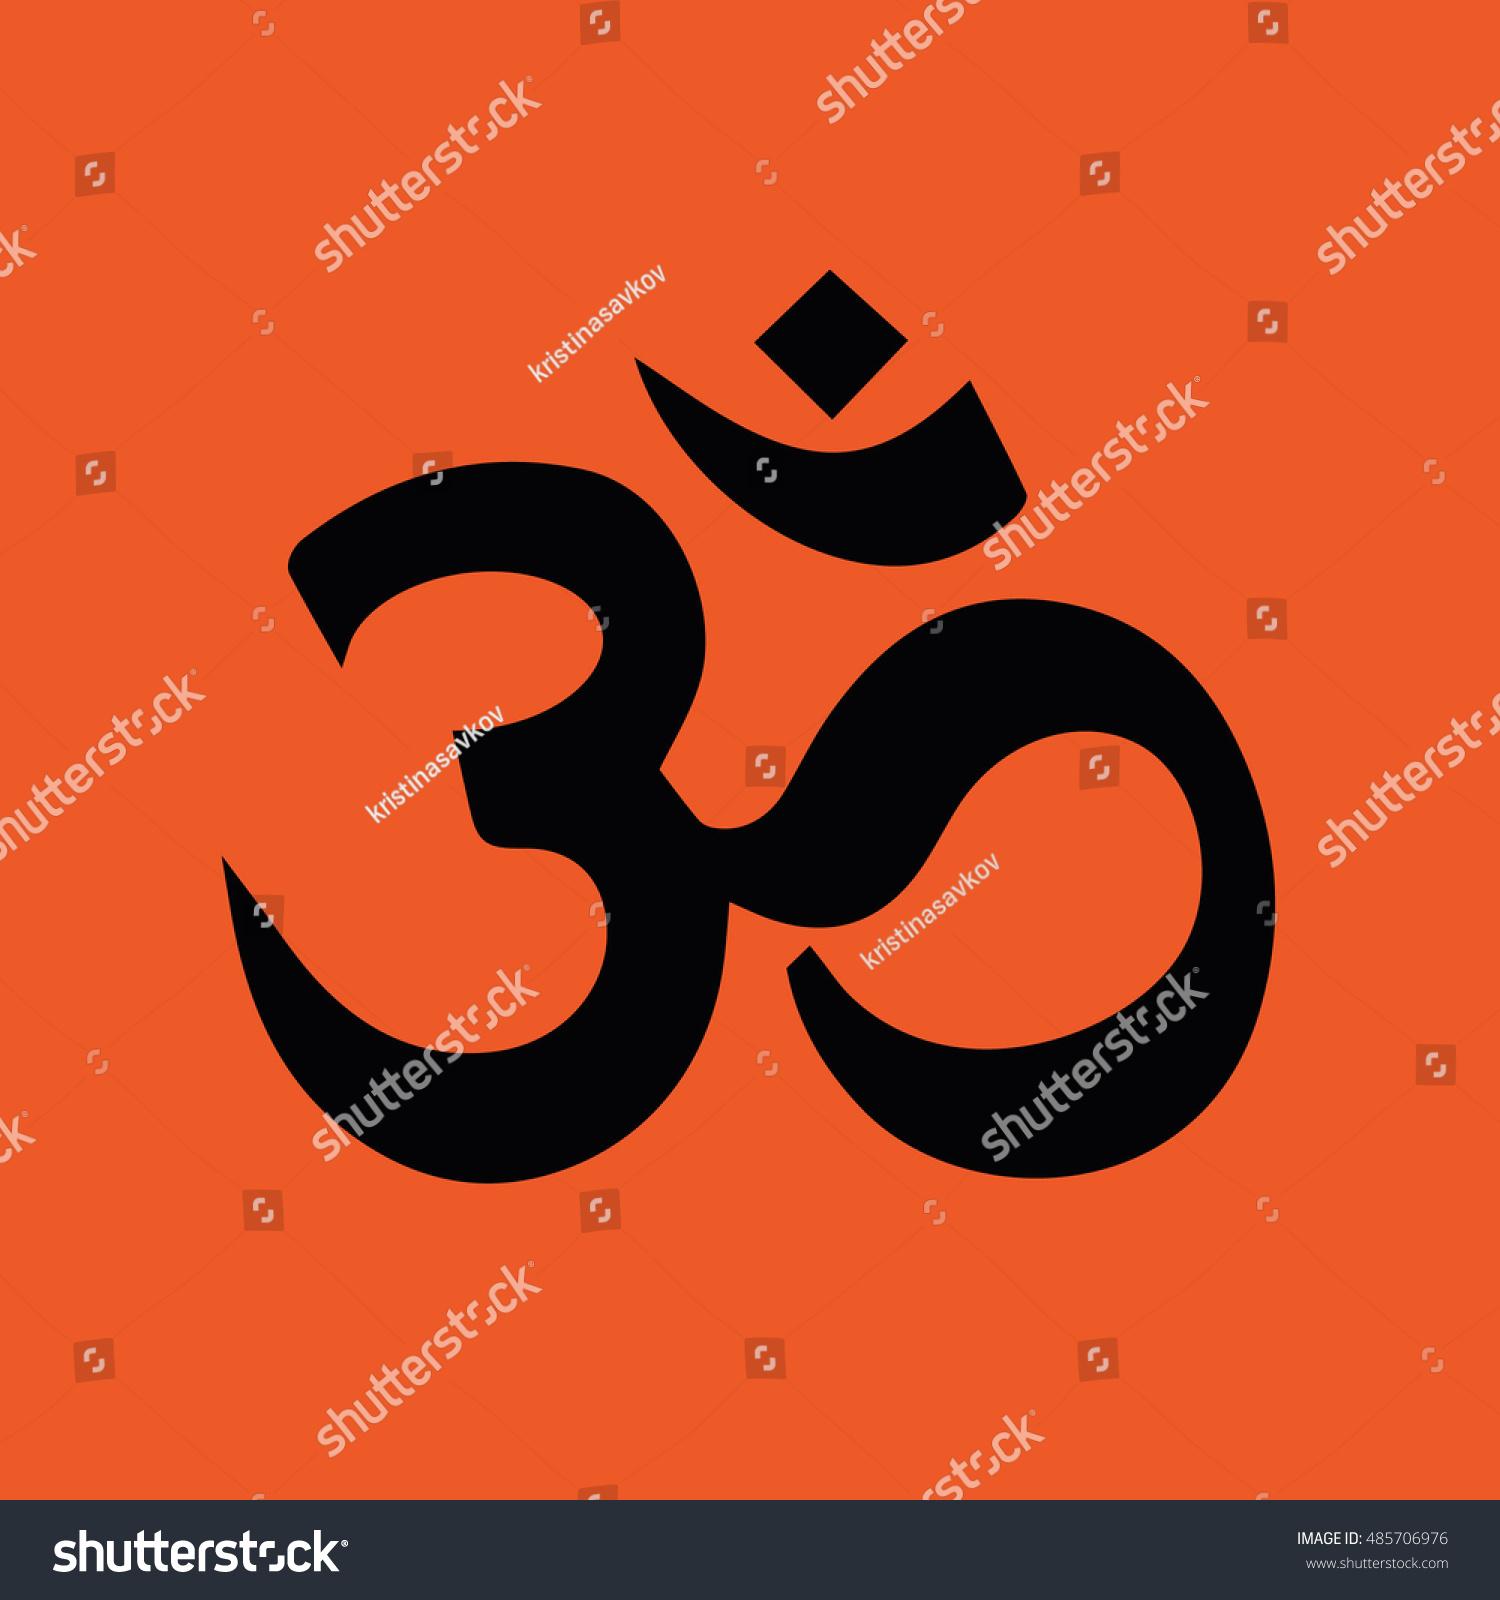 Om symbol hinduism vector icon orange stock vector 485706976 om symbol of hinduism vector icon orange background biocorpaavc